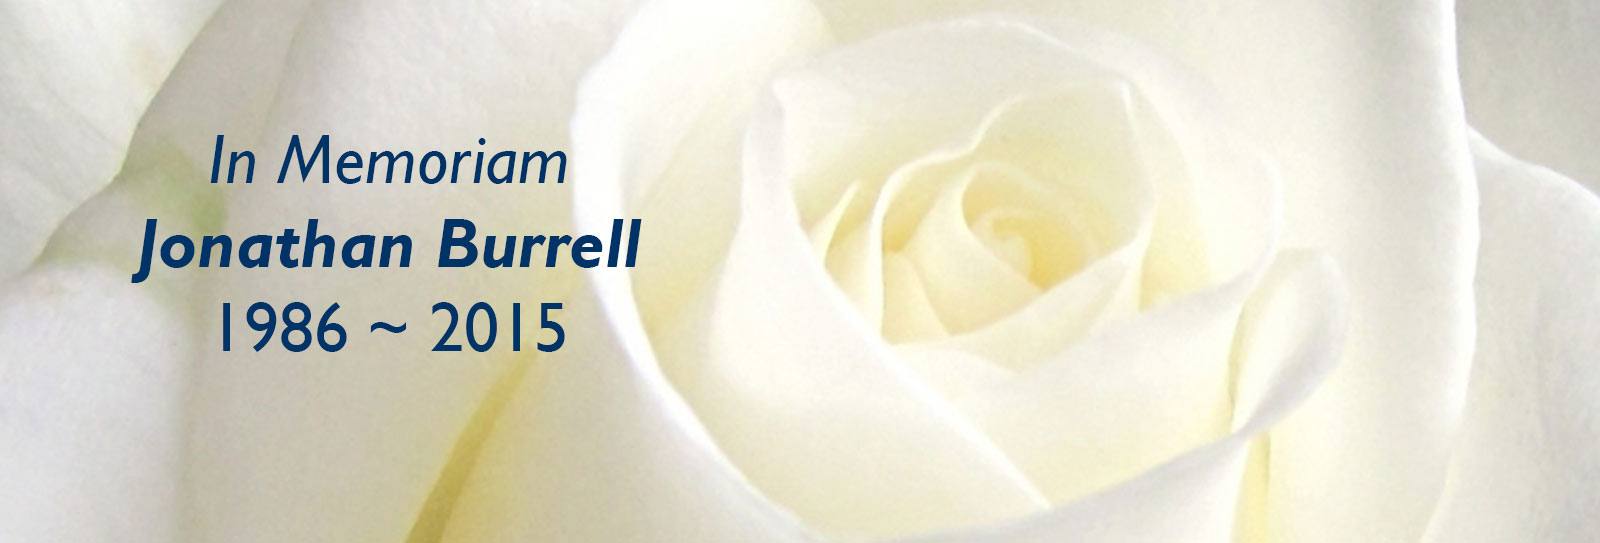 In Memoriam: Jonathan Burrell